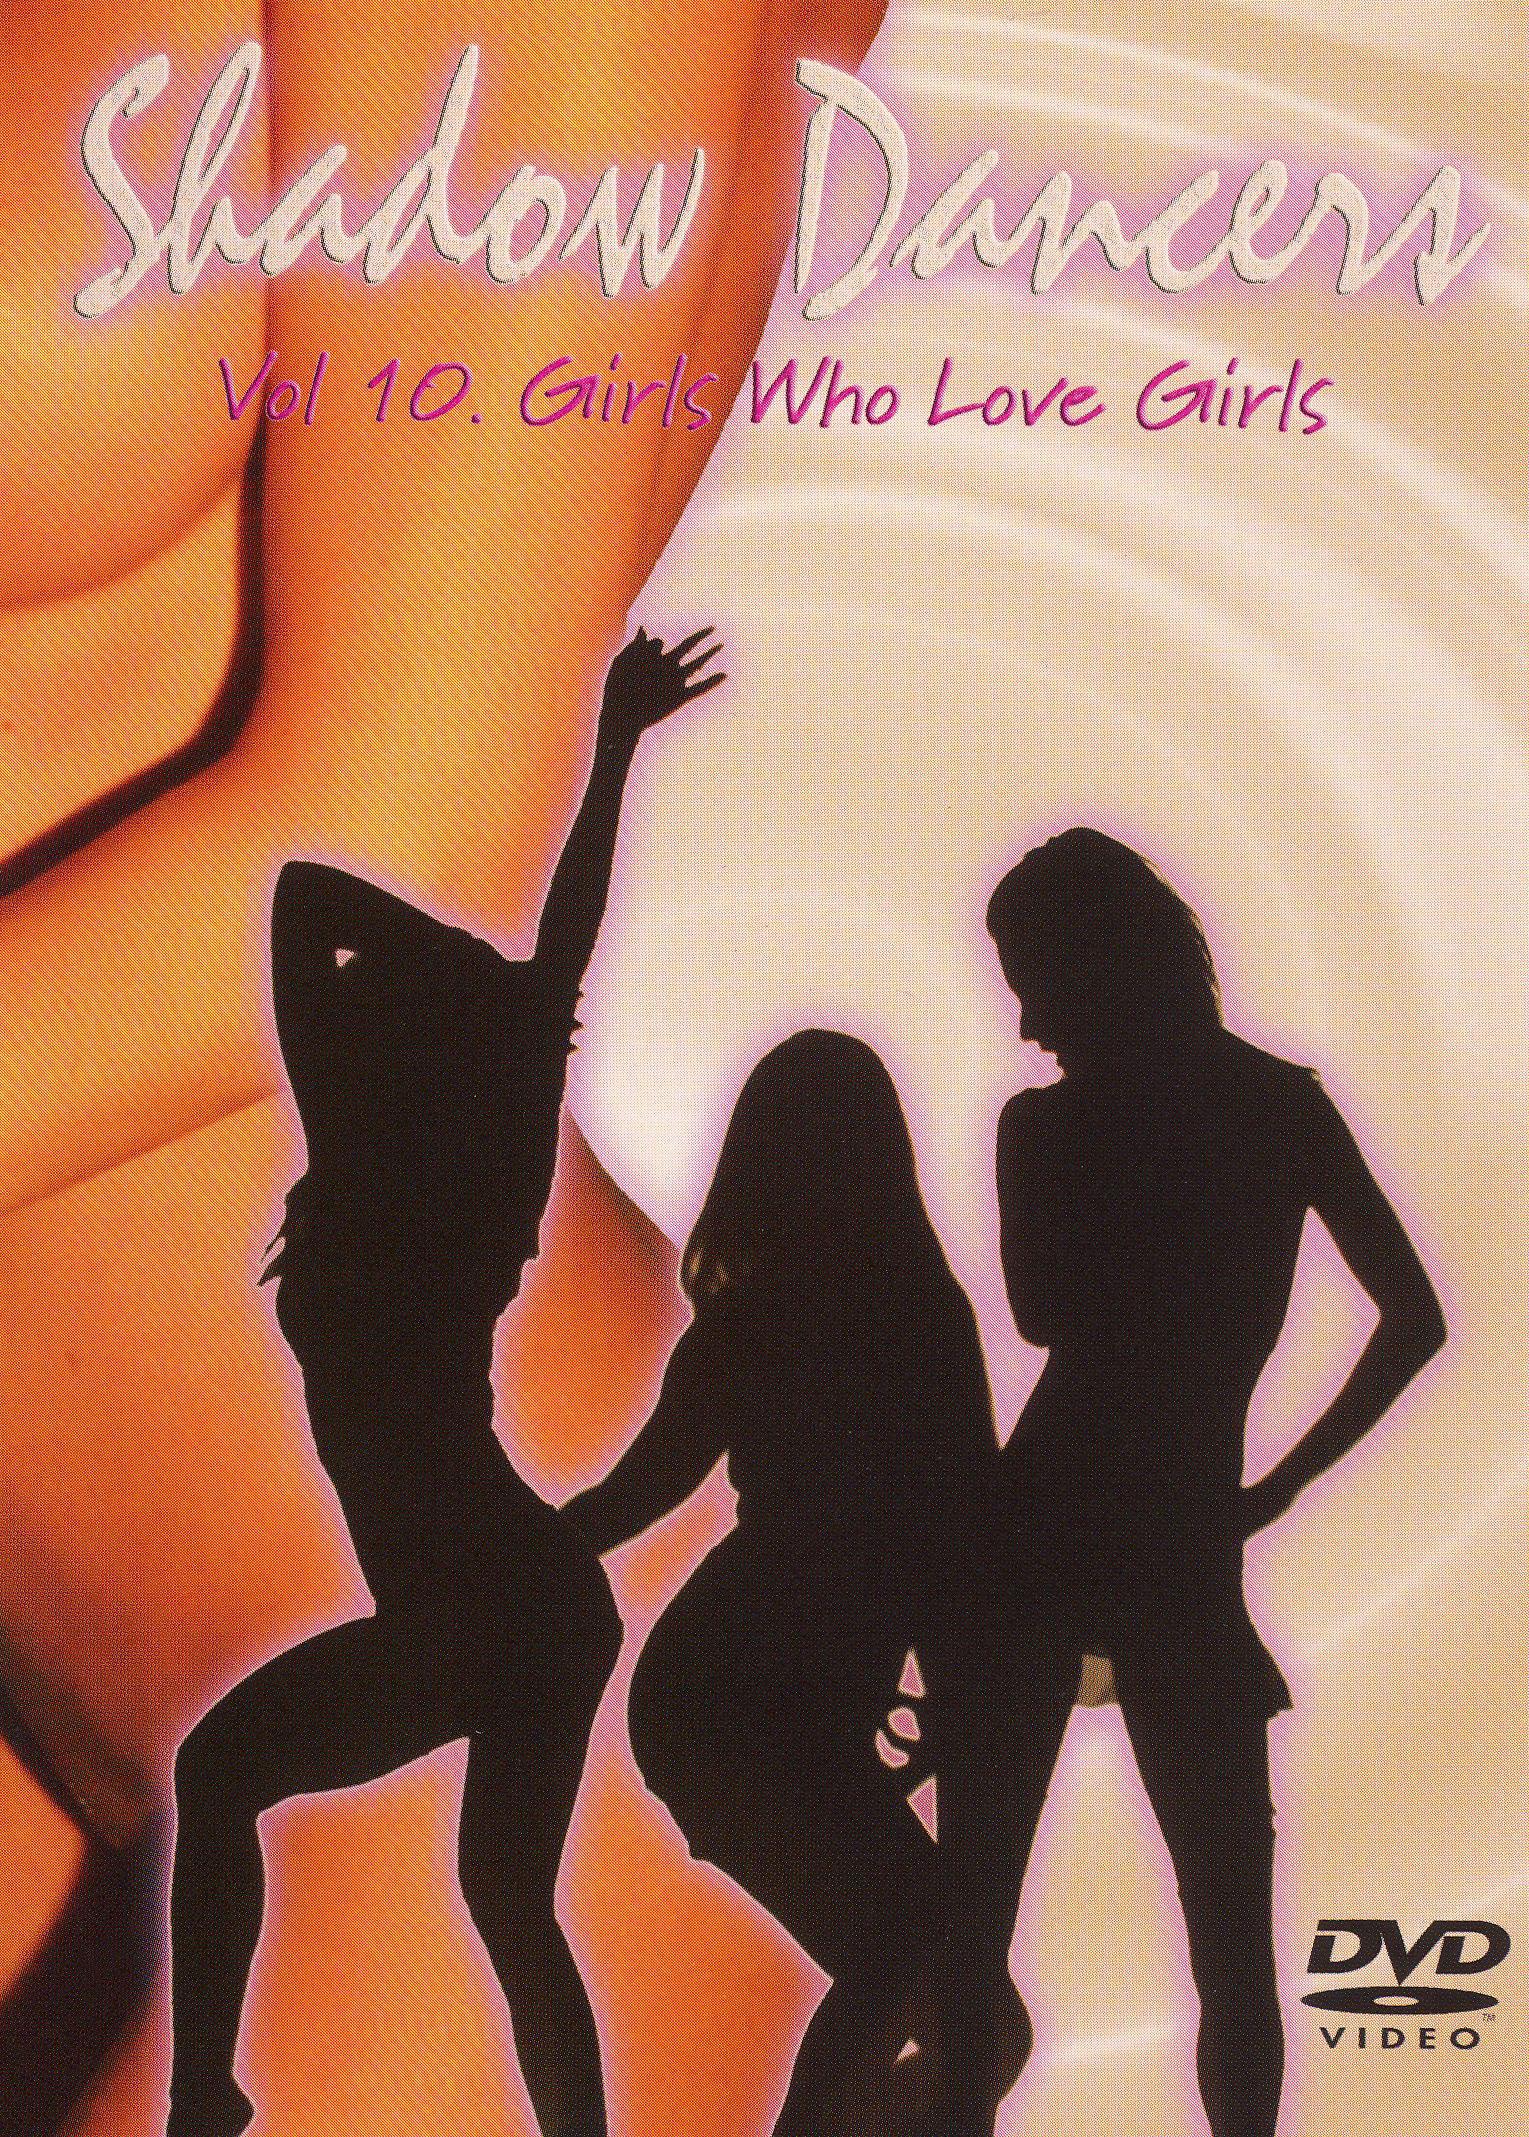 Shadow Dancers, Vol. 10: Girls Who Love Girls